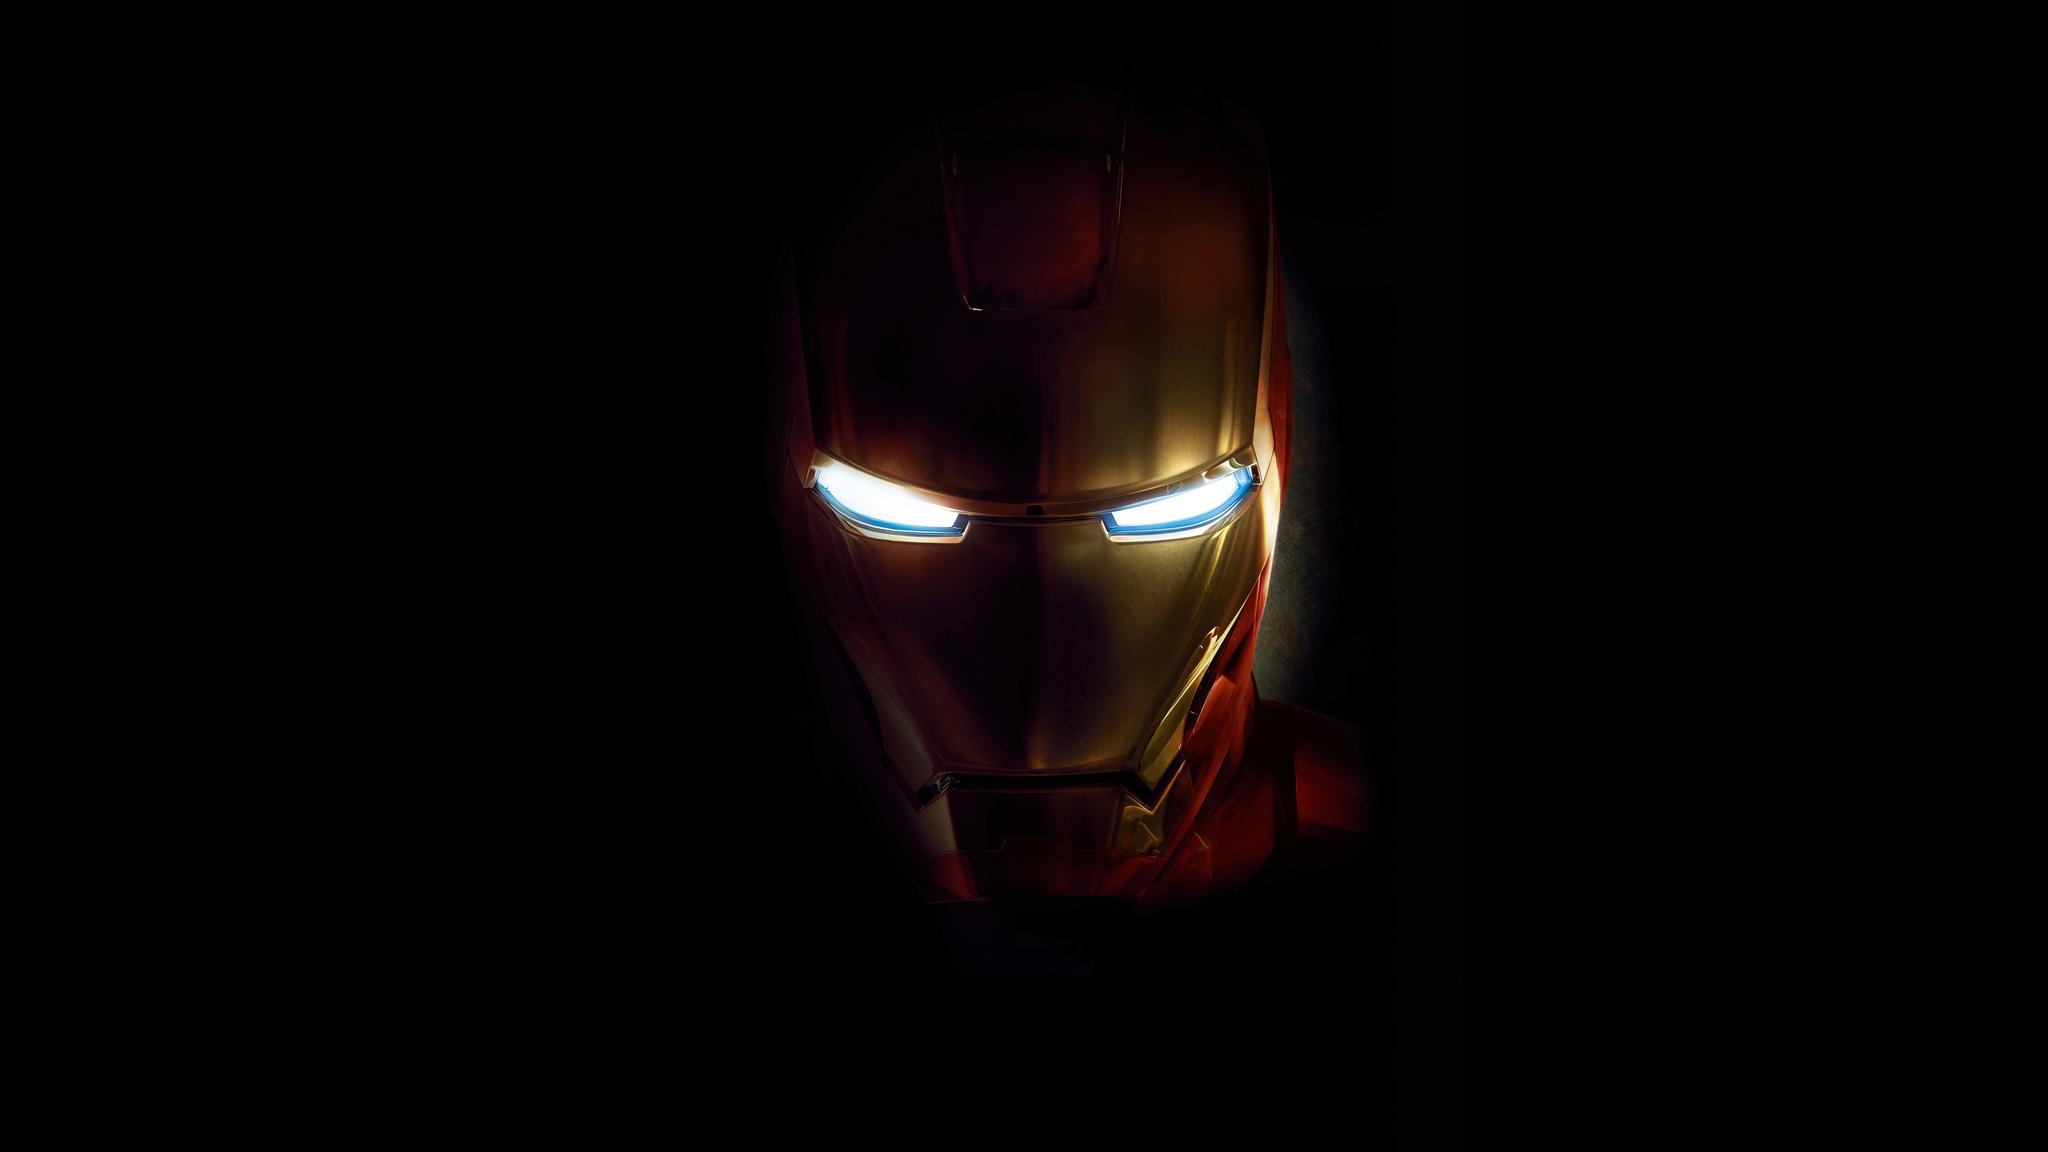 iron-man-2008-5k-a6.jpg